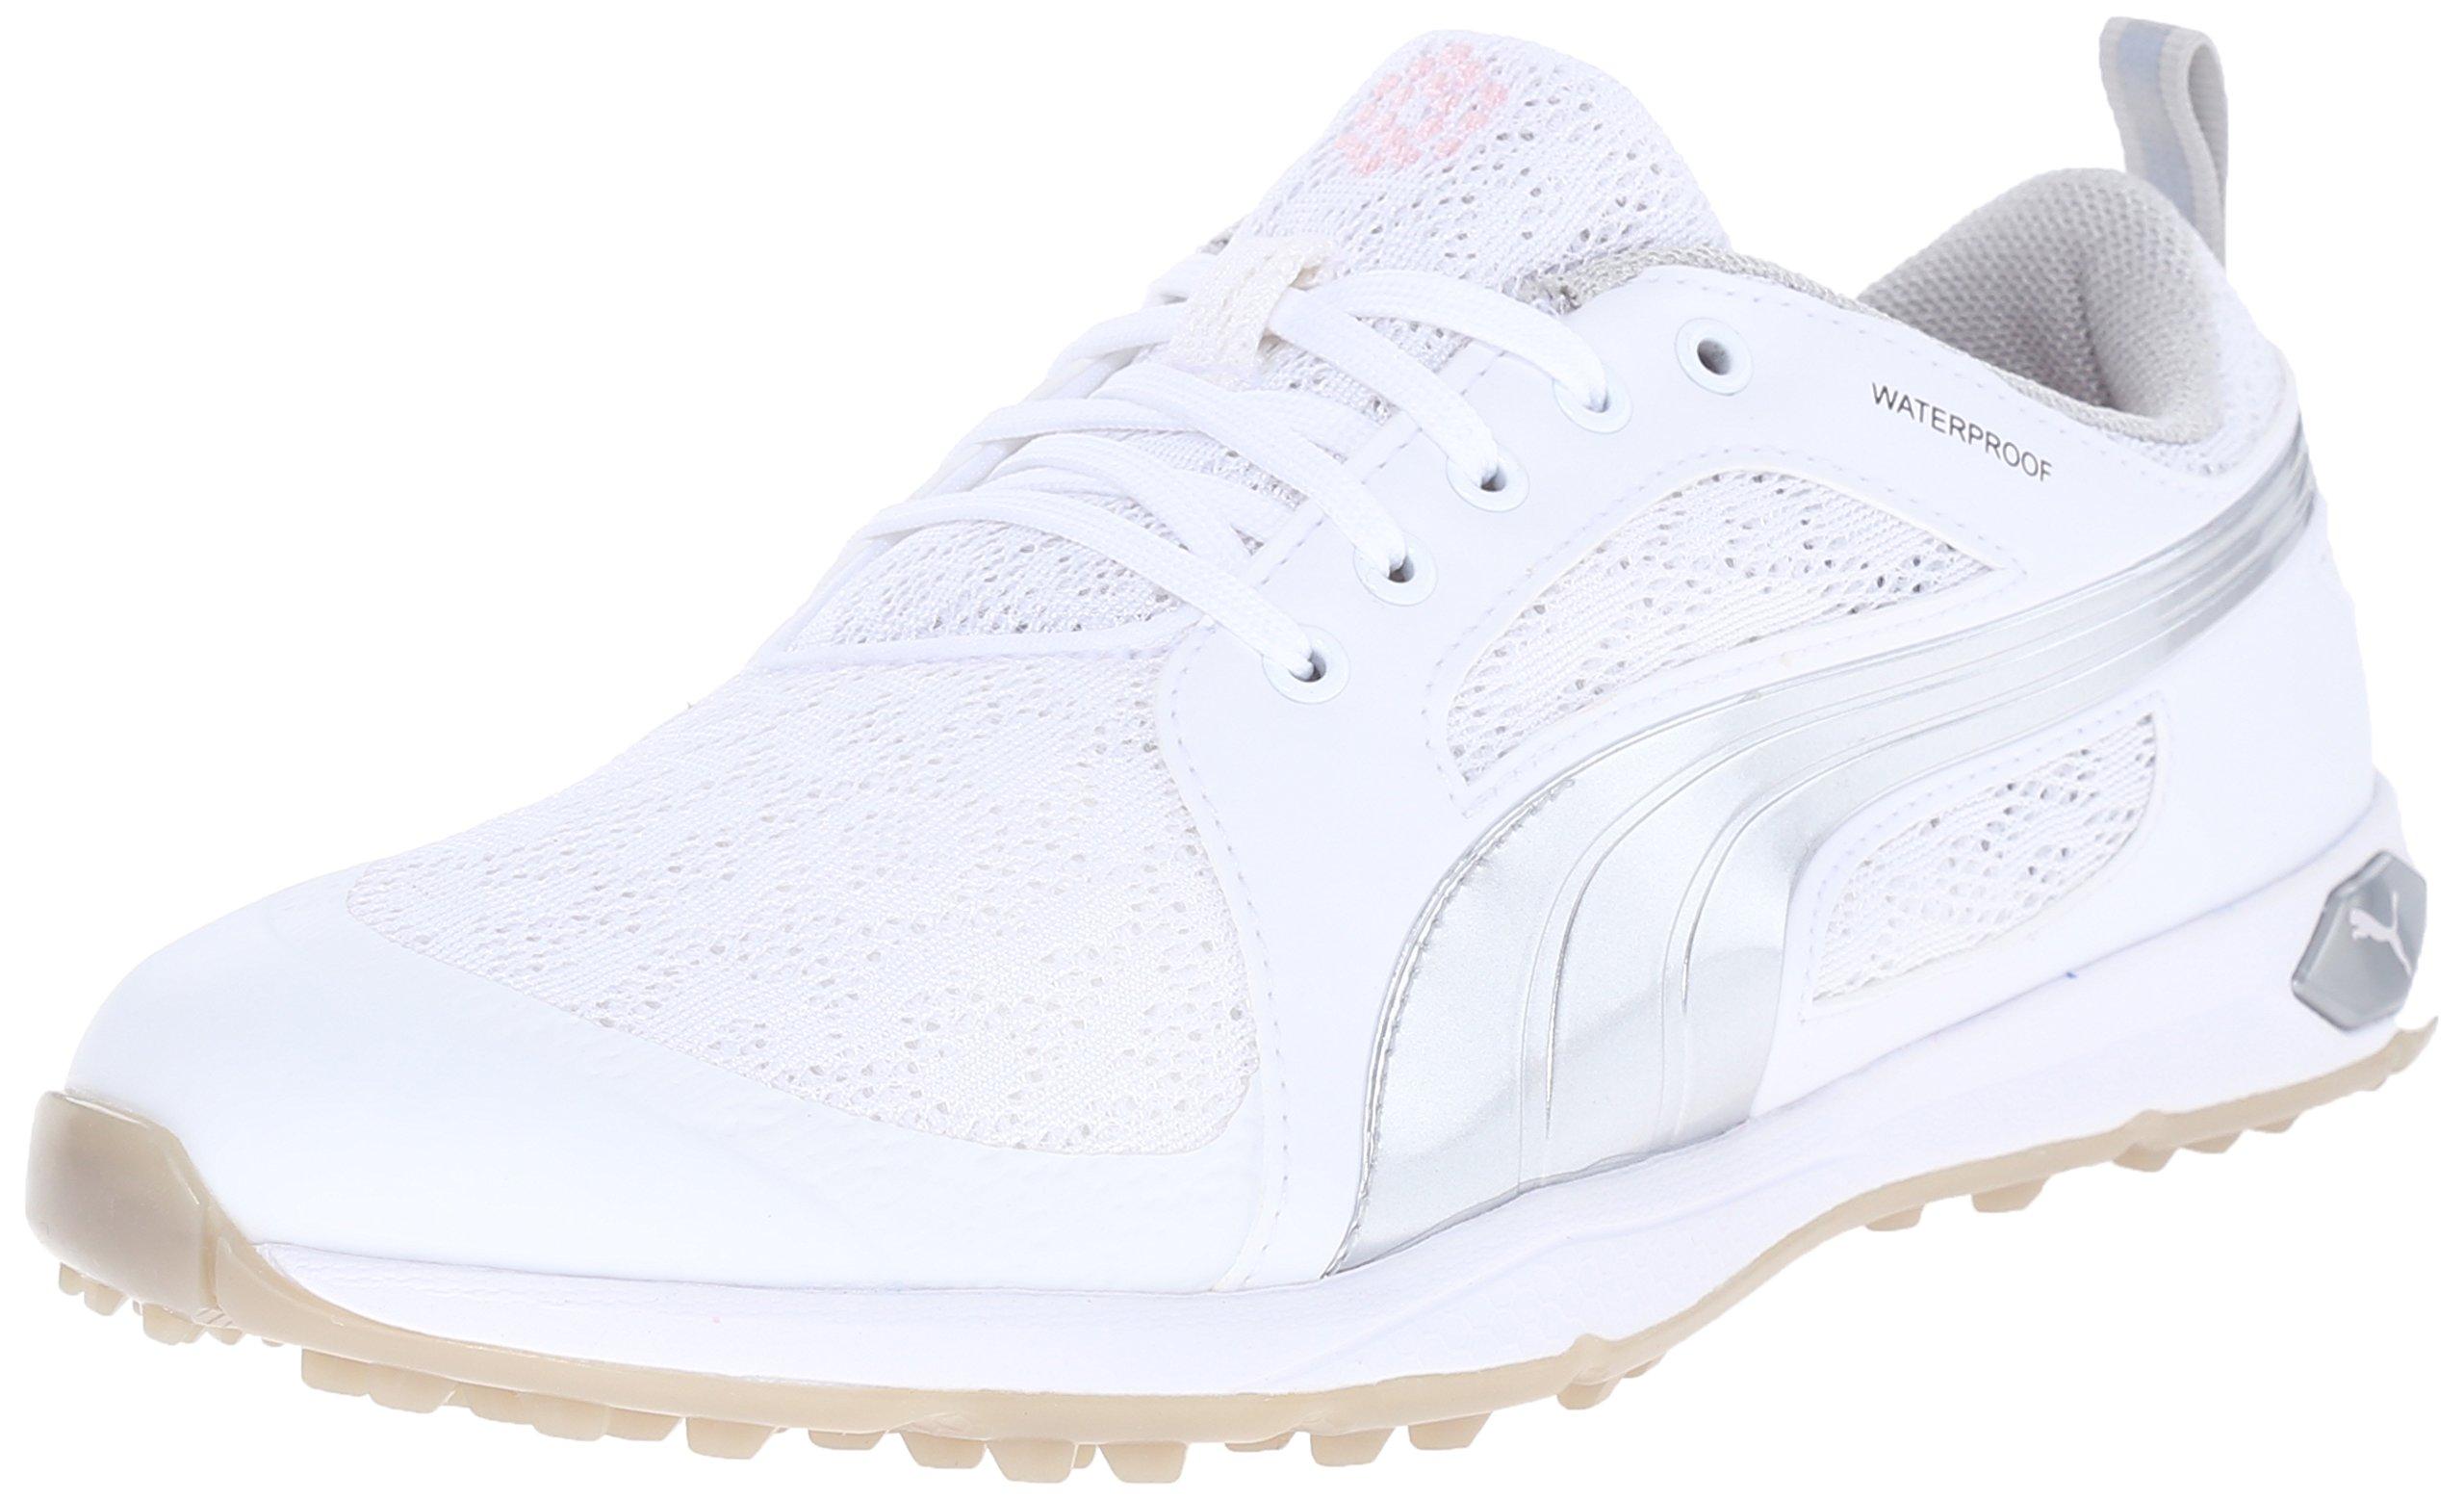 Galleon - PUMA Women s Biofly Mesh WMNS Golf Shoe White Silver 2c2414fbf